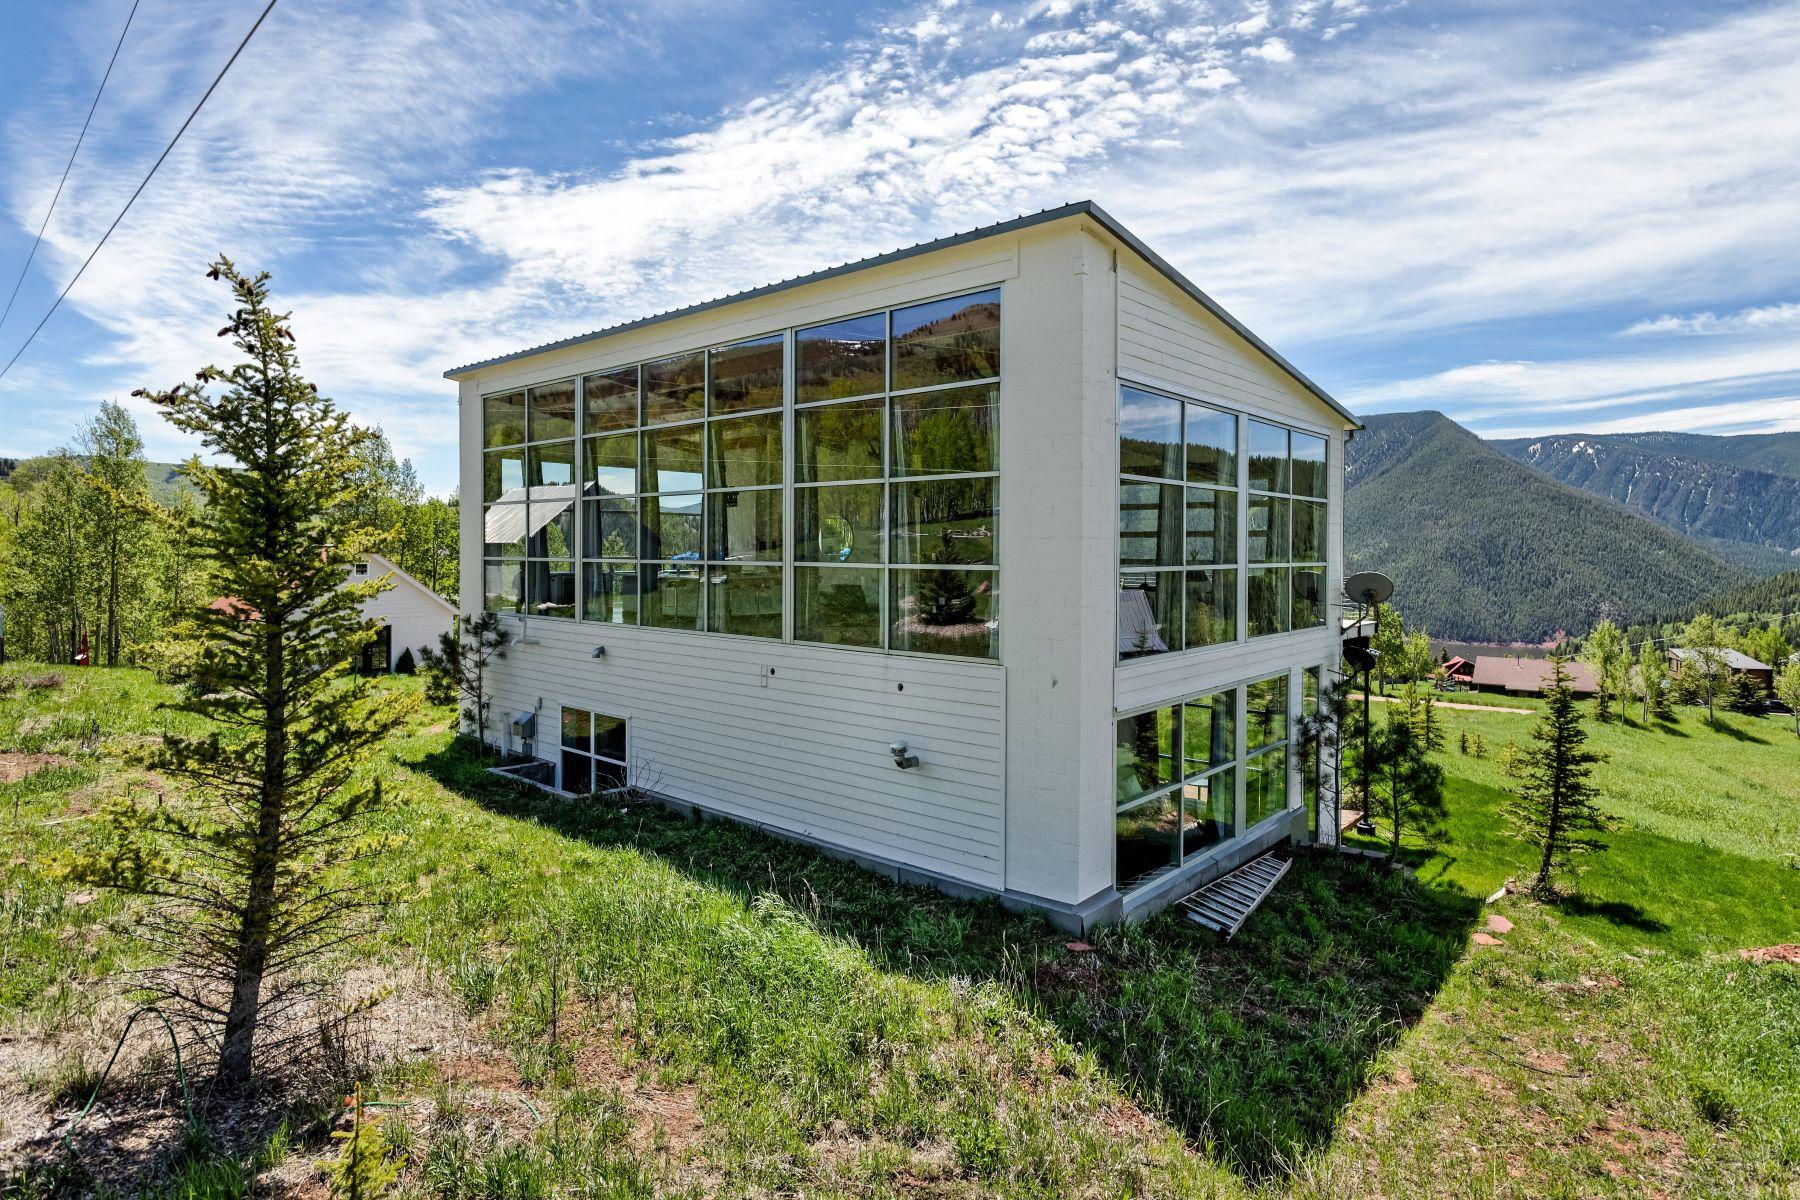 Property for Sale at Ruedi Shores 175 Hawk Lane Basalt, Colorado 81621 United States